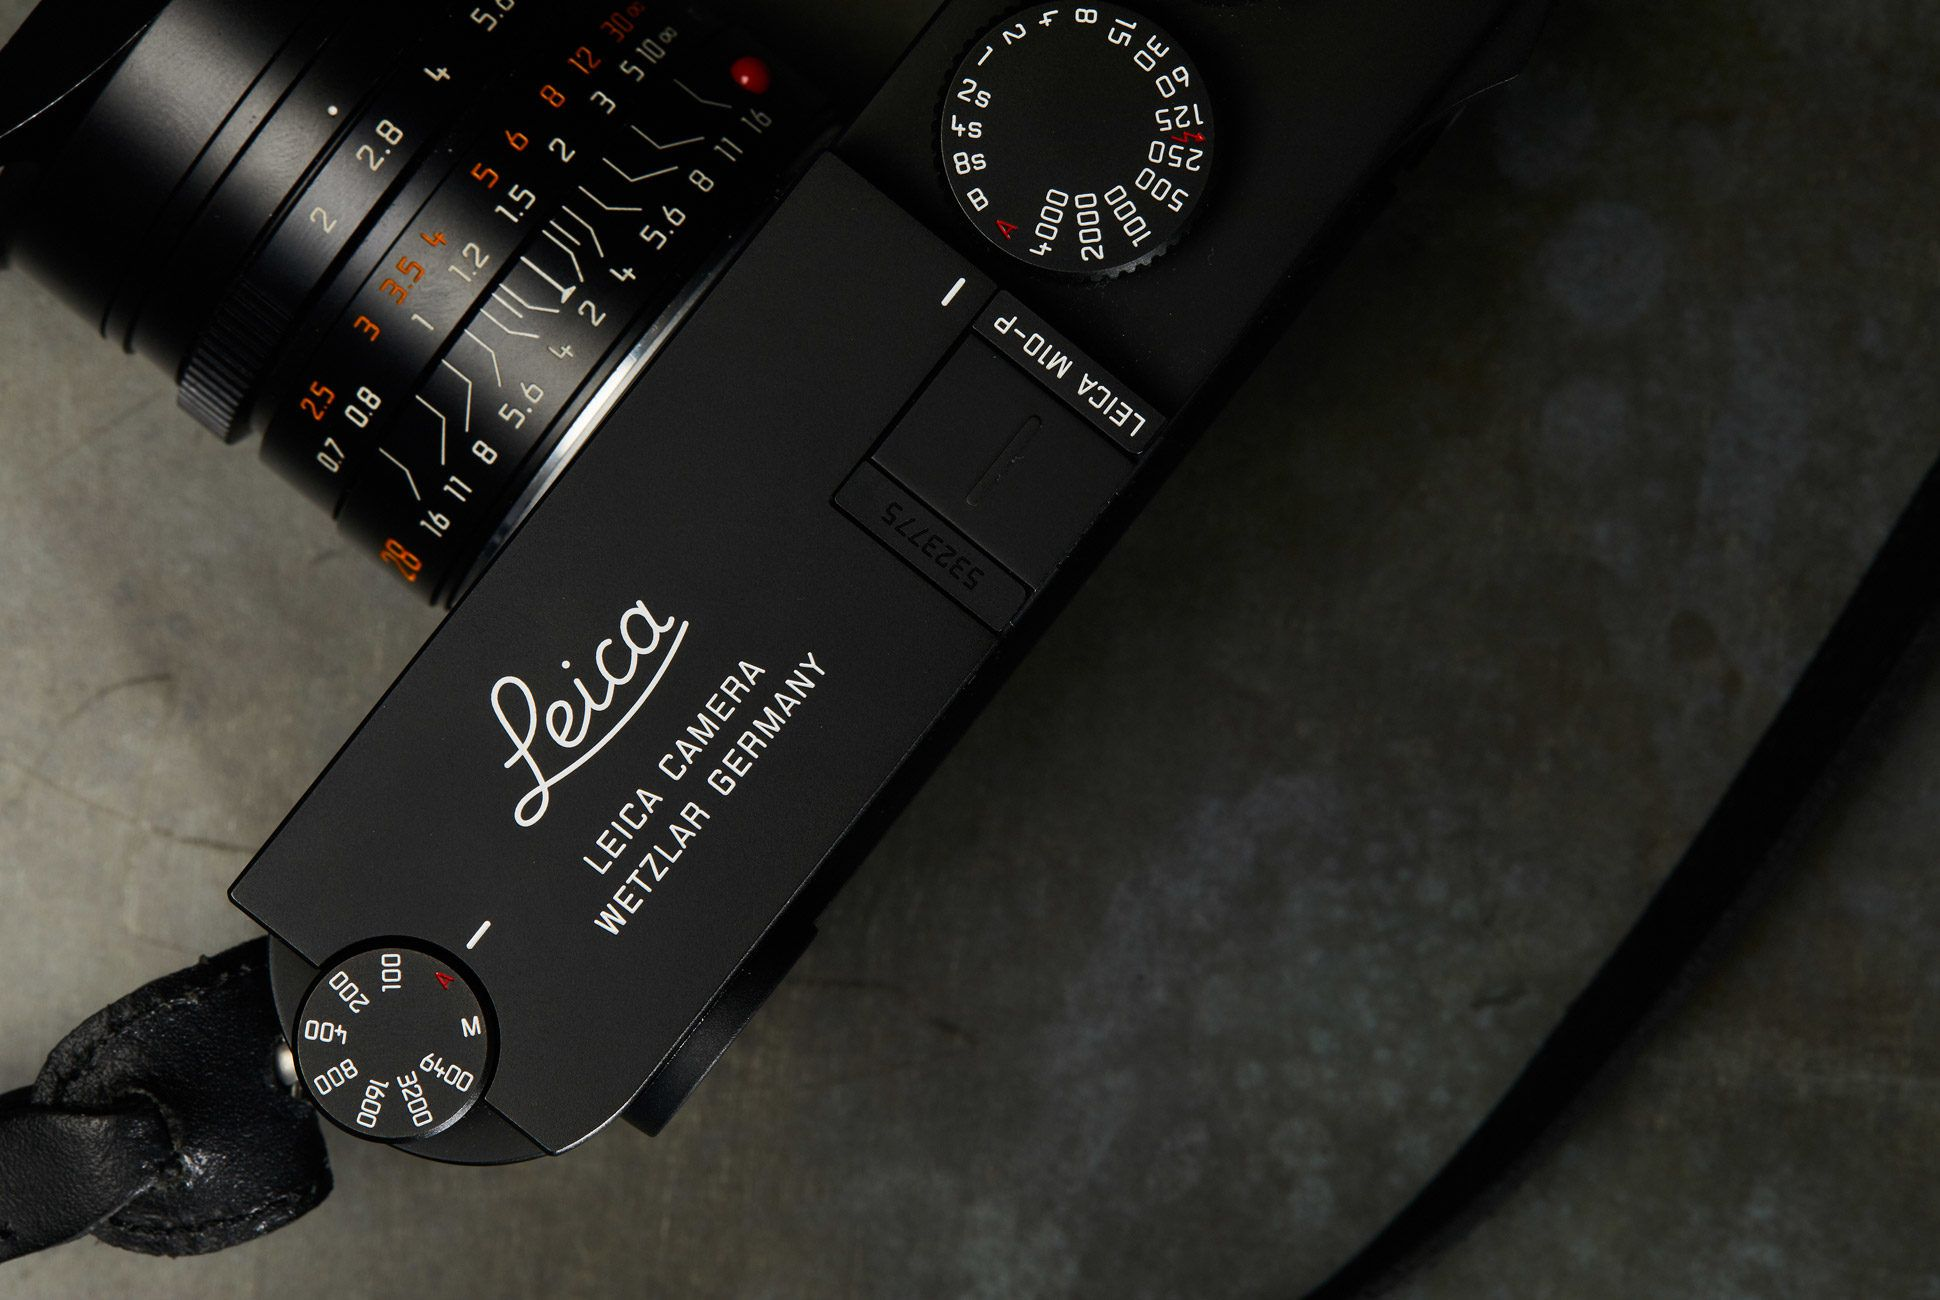 Leica-M10P-Gear-Patrol-Slide-4